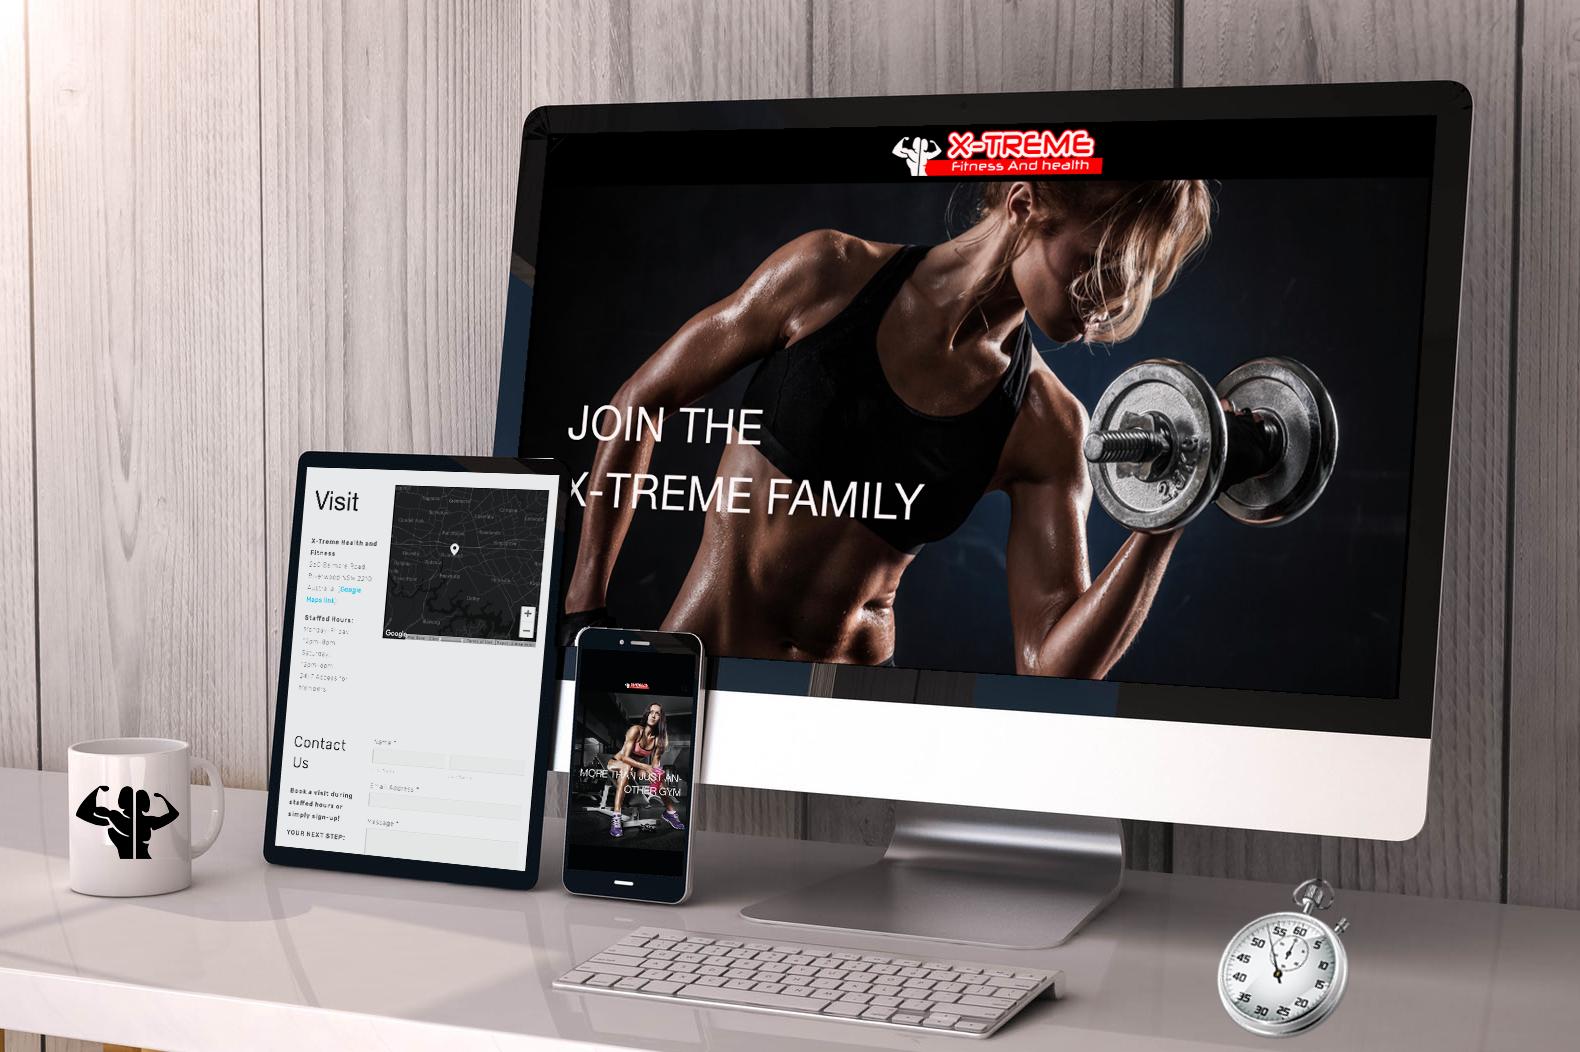 X-Treme Fitness: Website